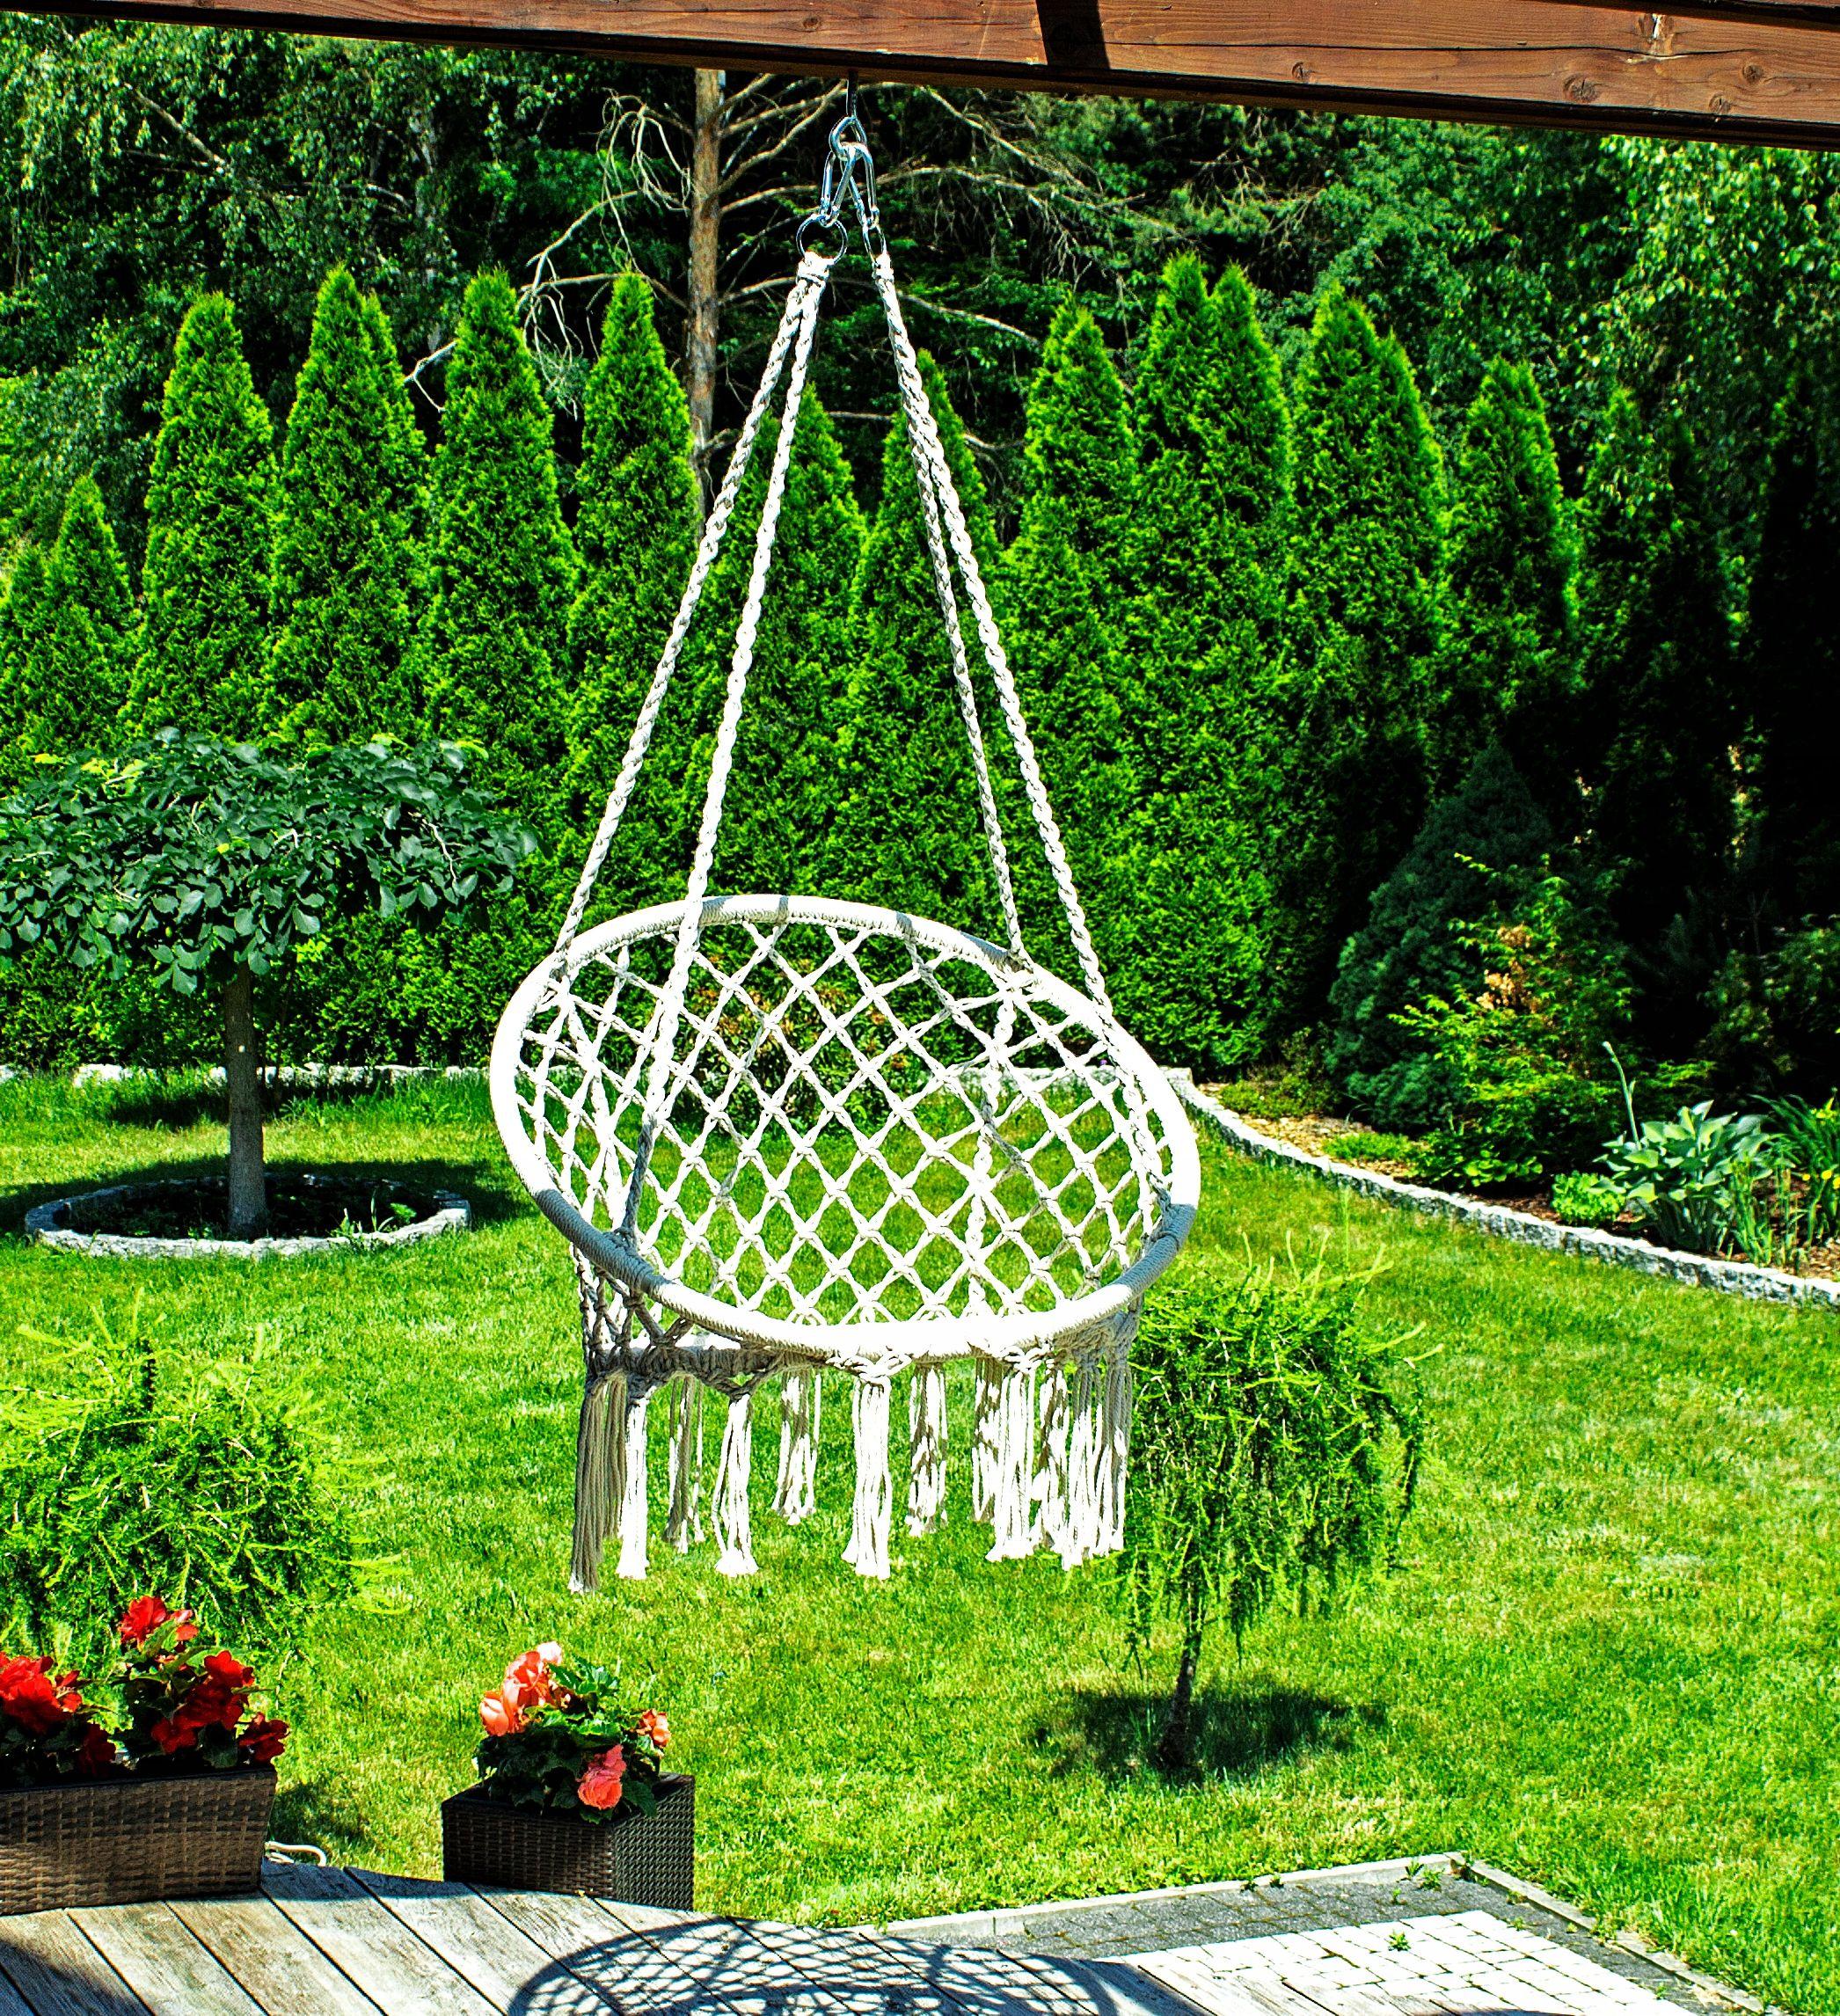 Rio Hustawka Fotel Wiszacy Bocianie Gniazdo 120kg 8144227166 Allegro Pl Hanging Chair Hanging Decor